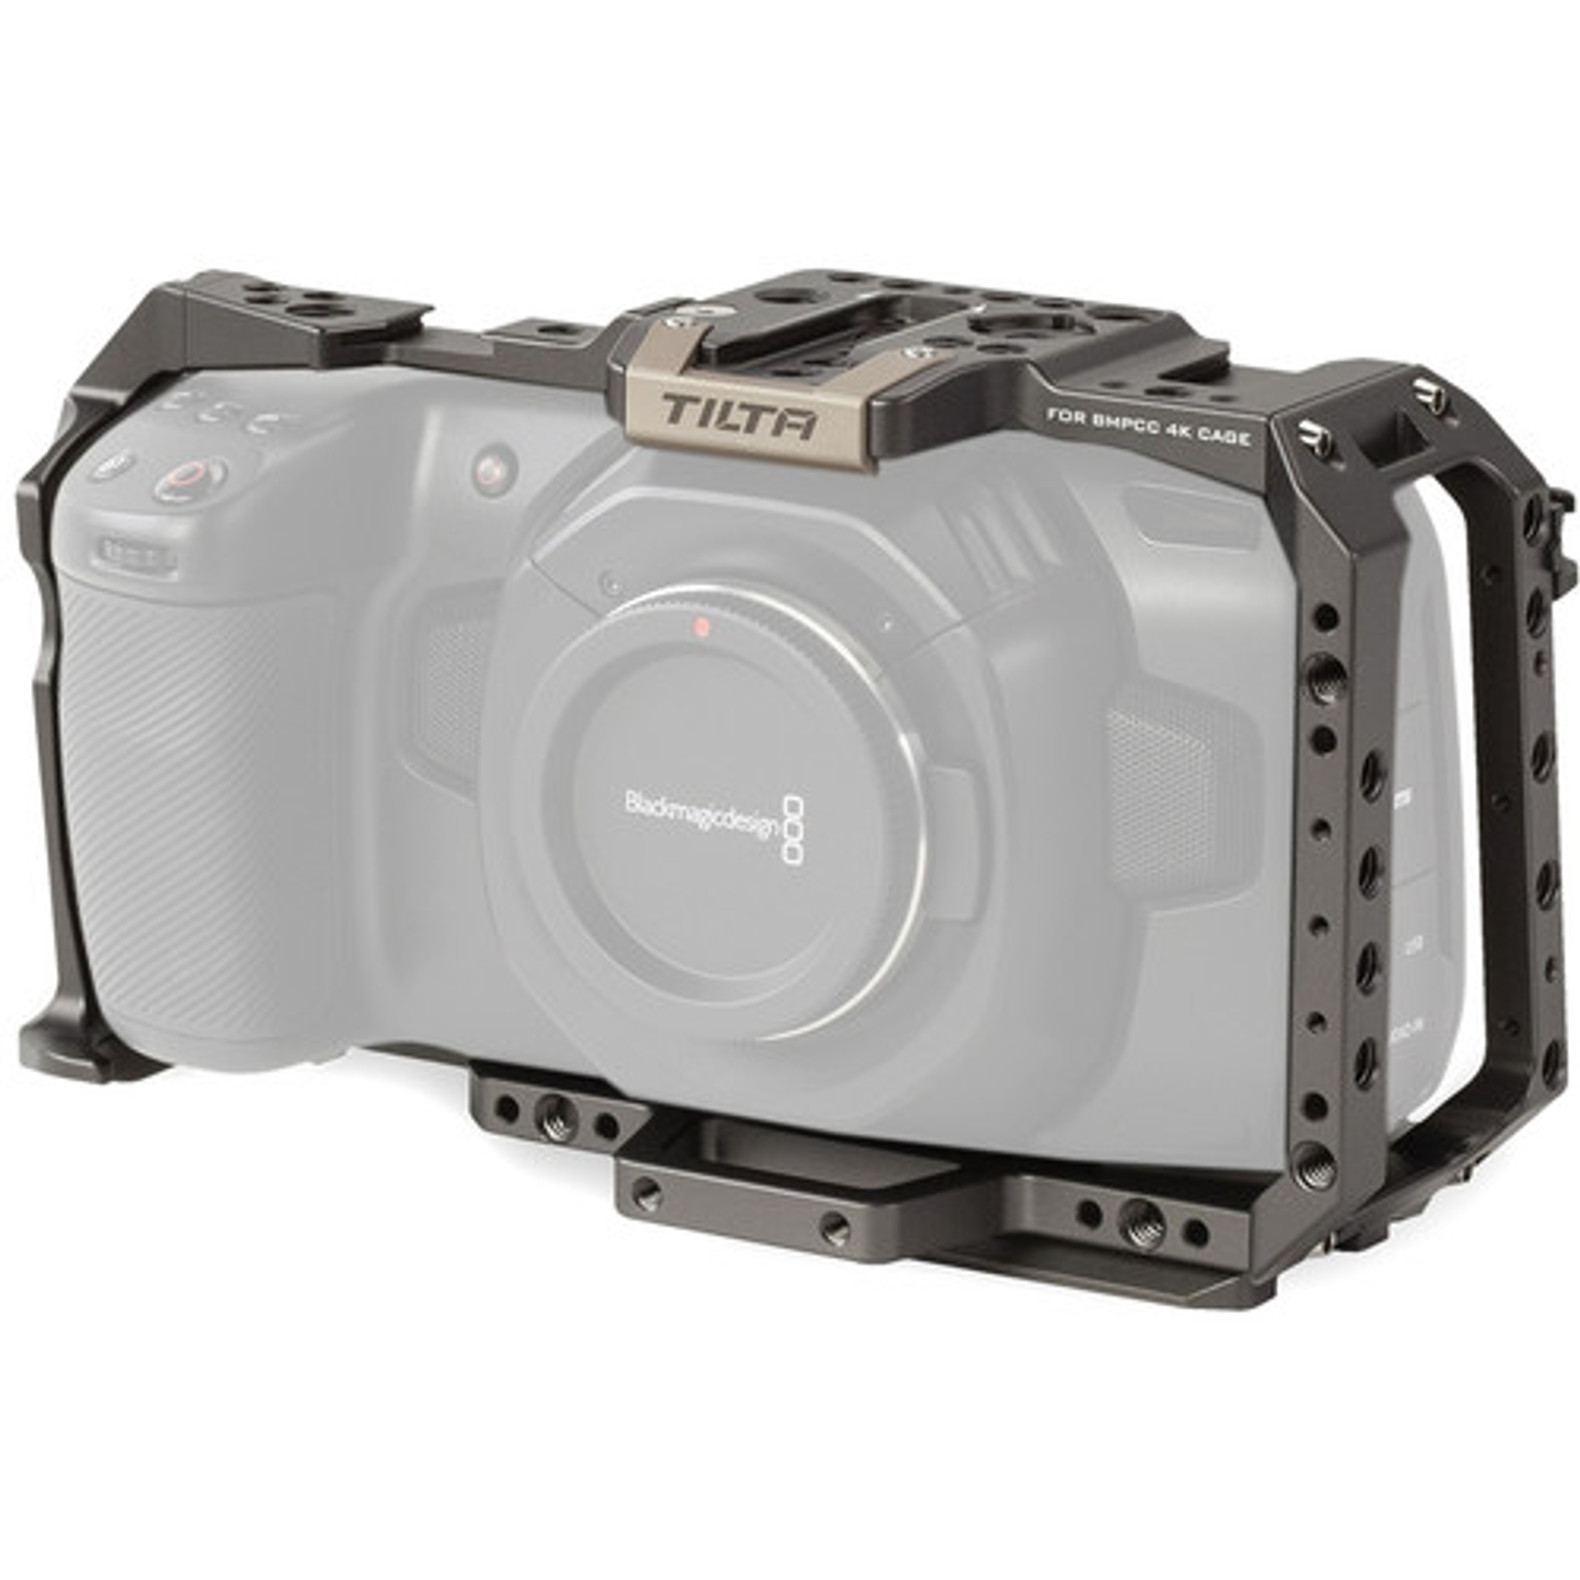 Tilta Full Camera Cage For Blackmagic Design Pocket Cinema Camera 4k 6k Tilta Gray